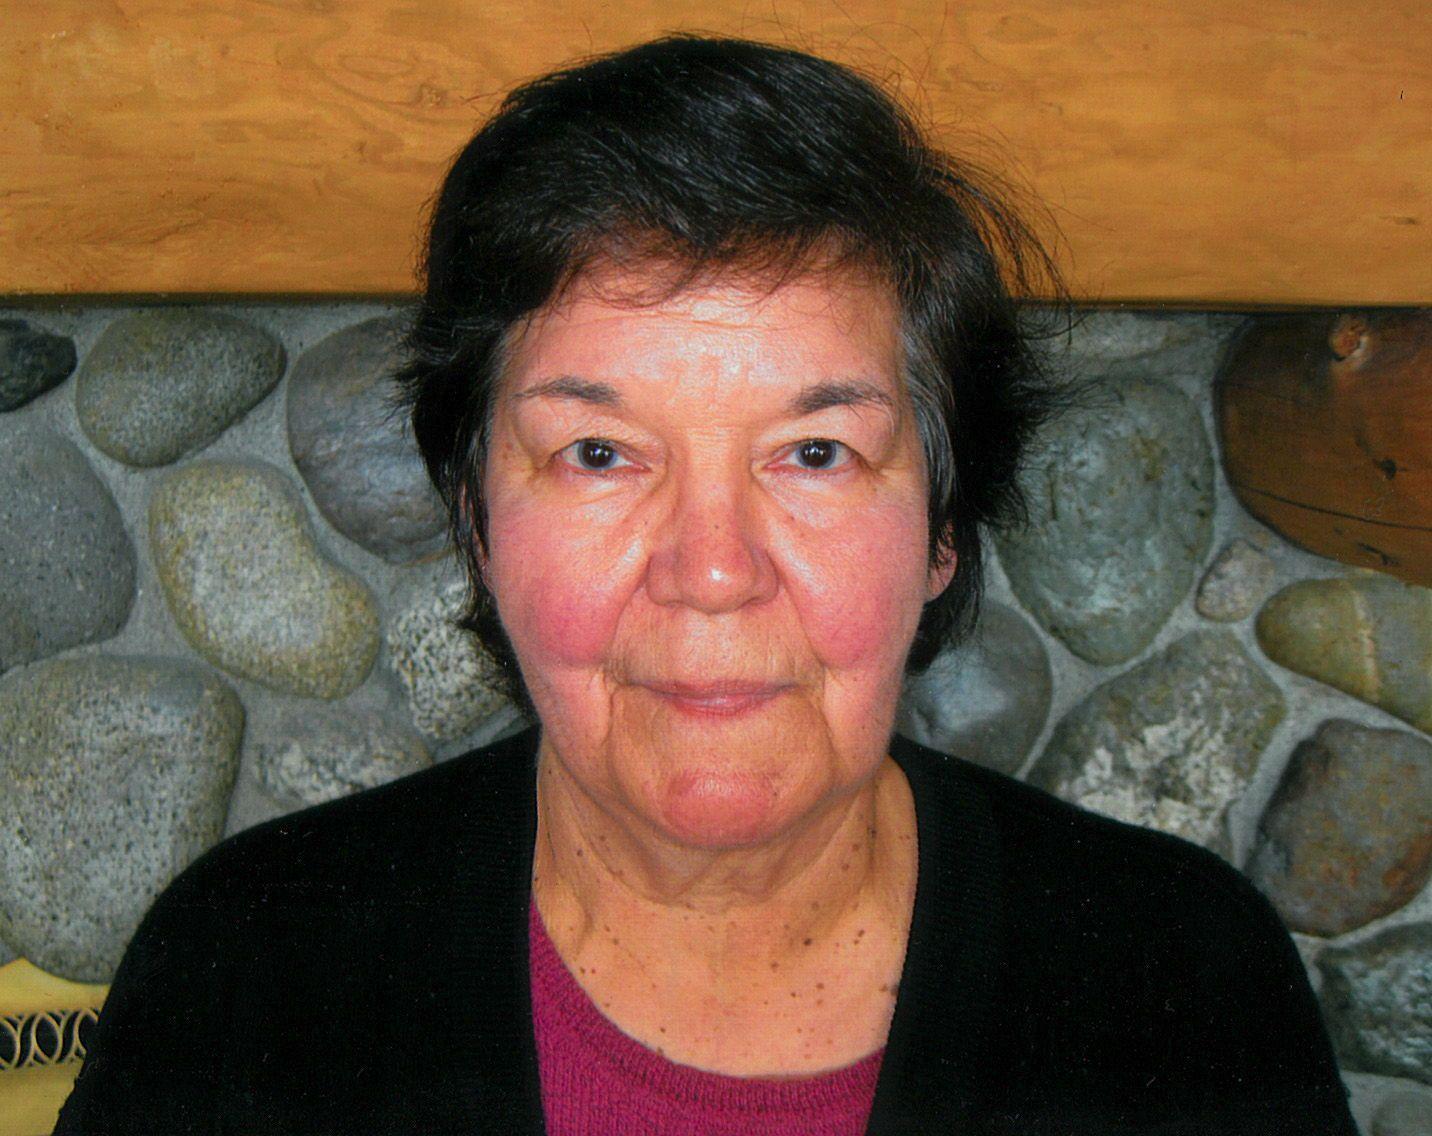 Diane Janes